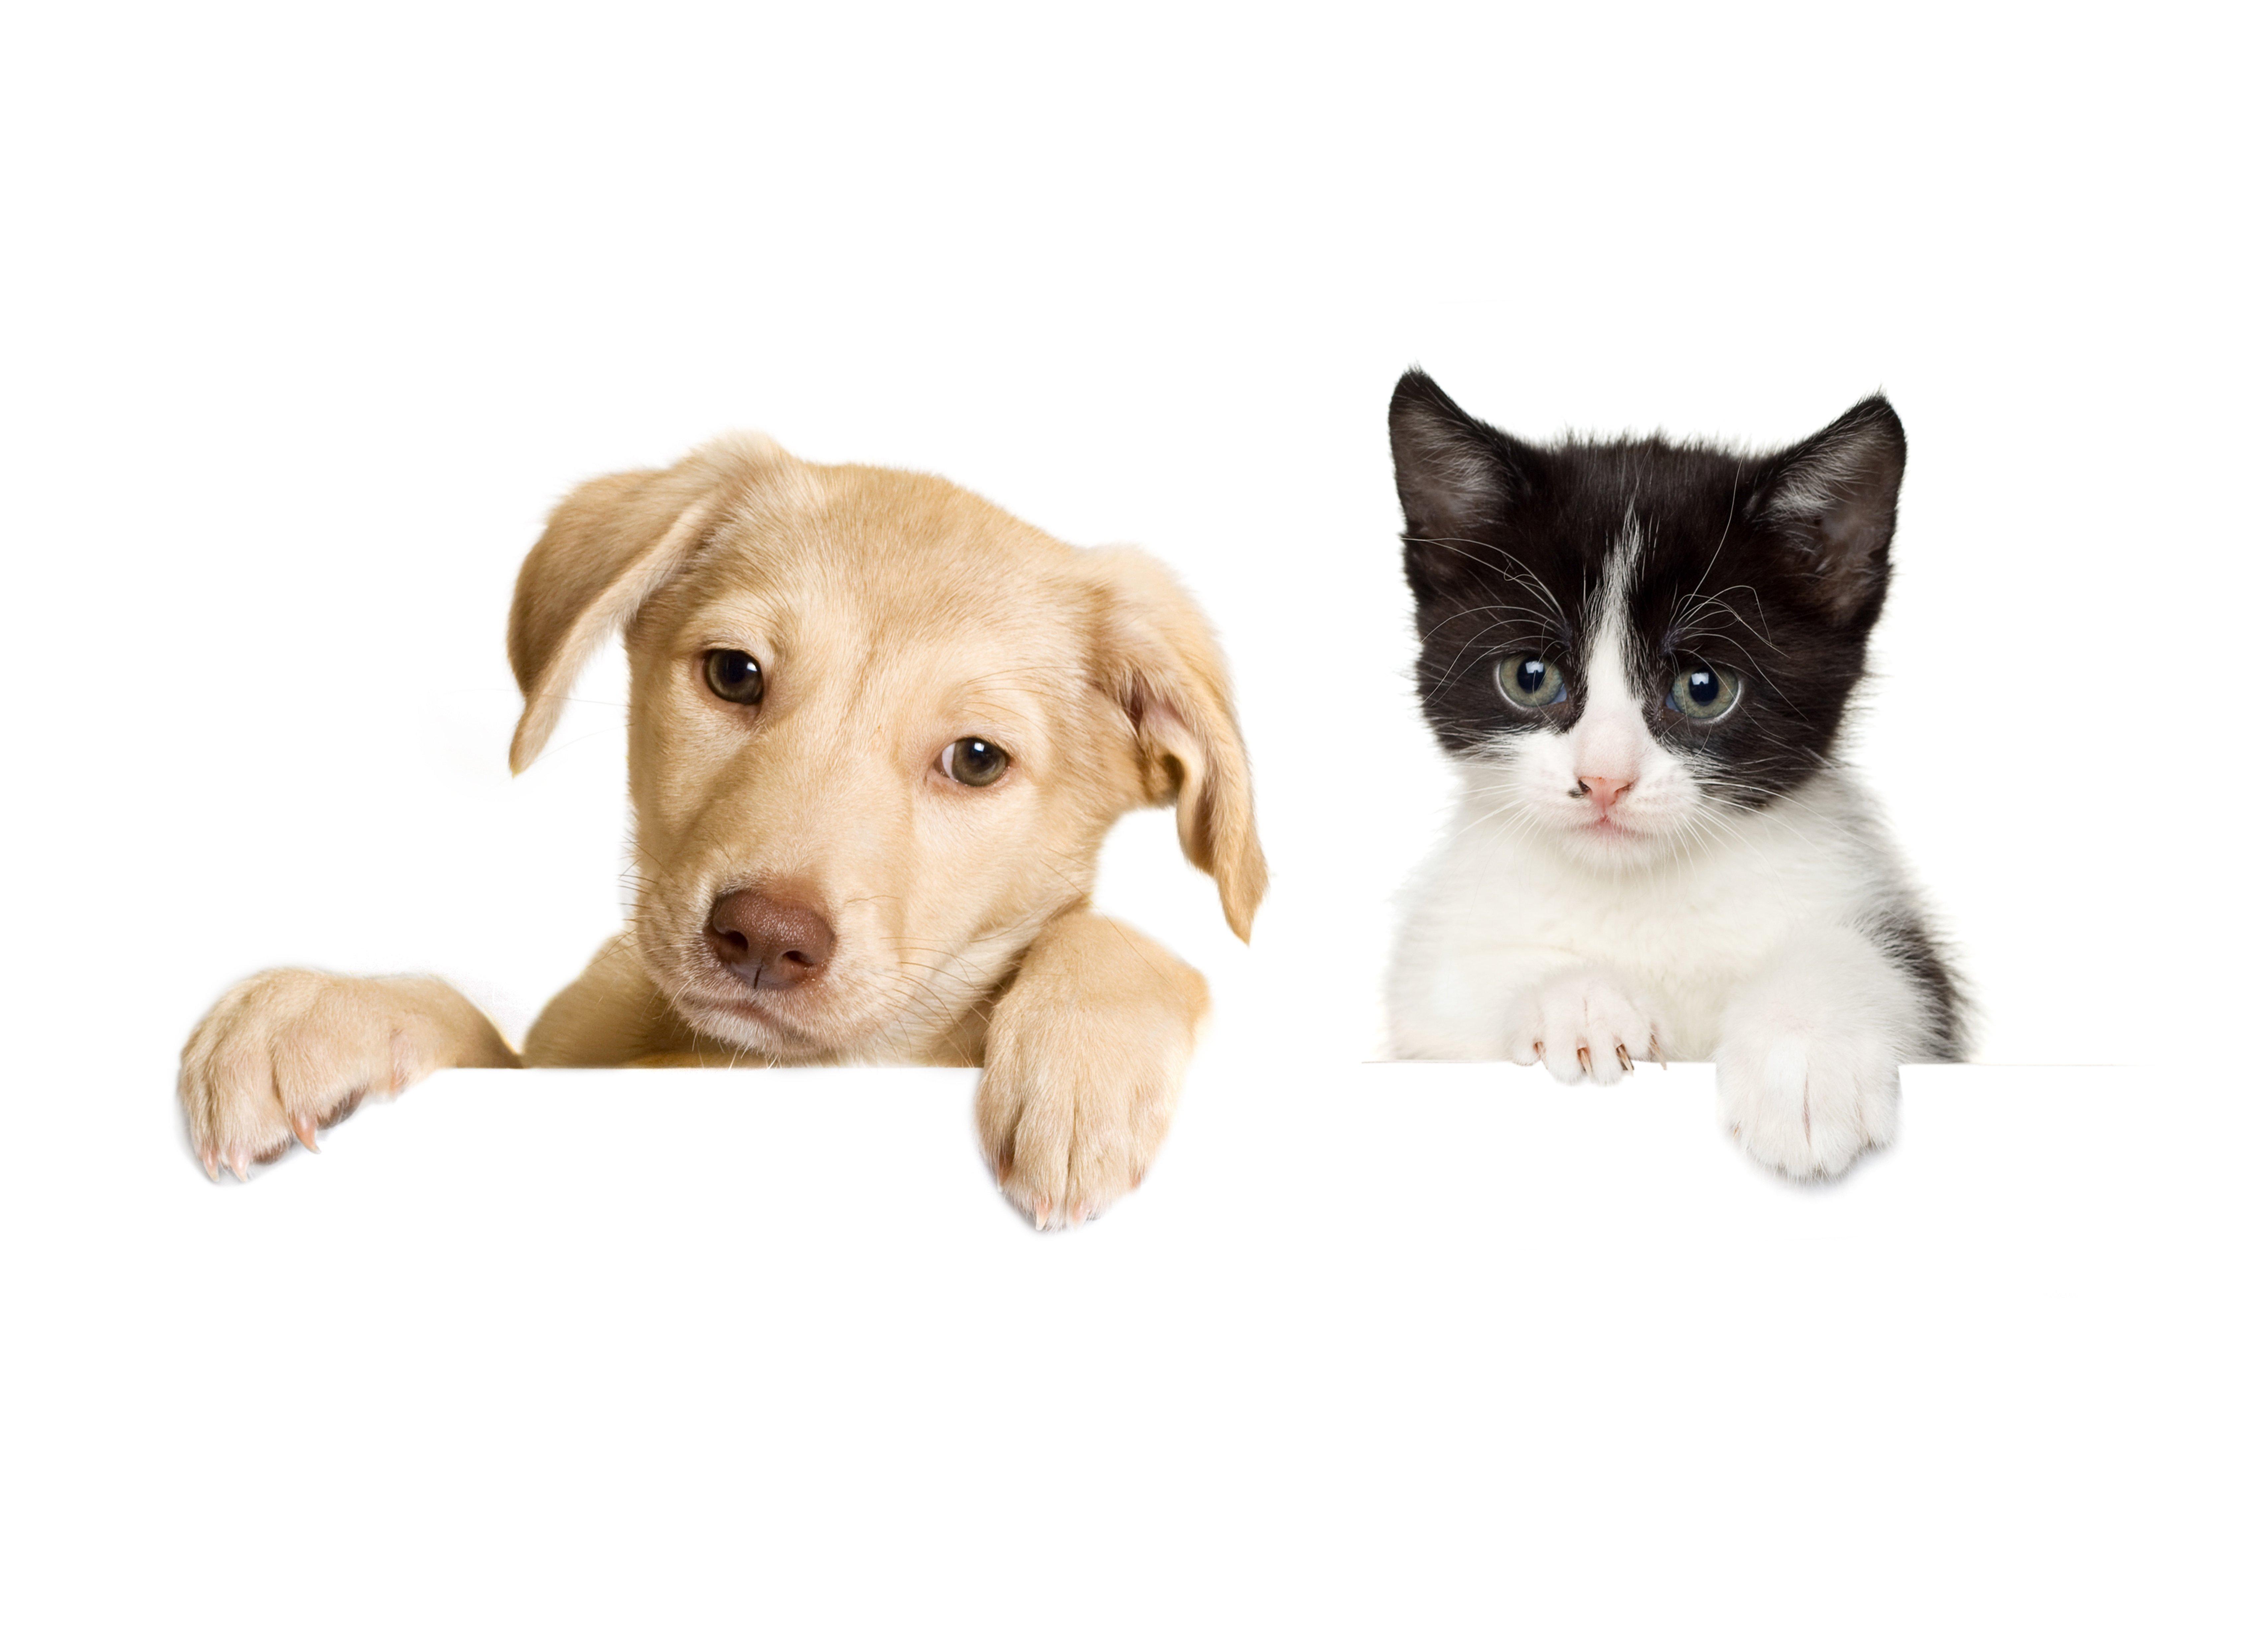 dogs cats puppy kitten baby wallpaper 6836x4942 649226